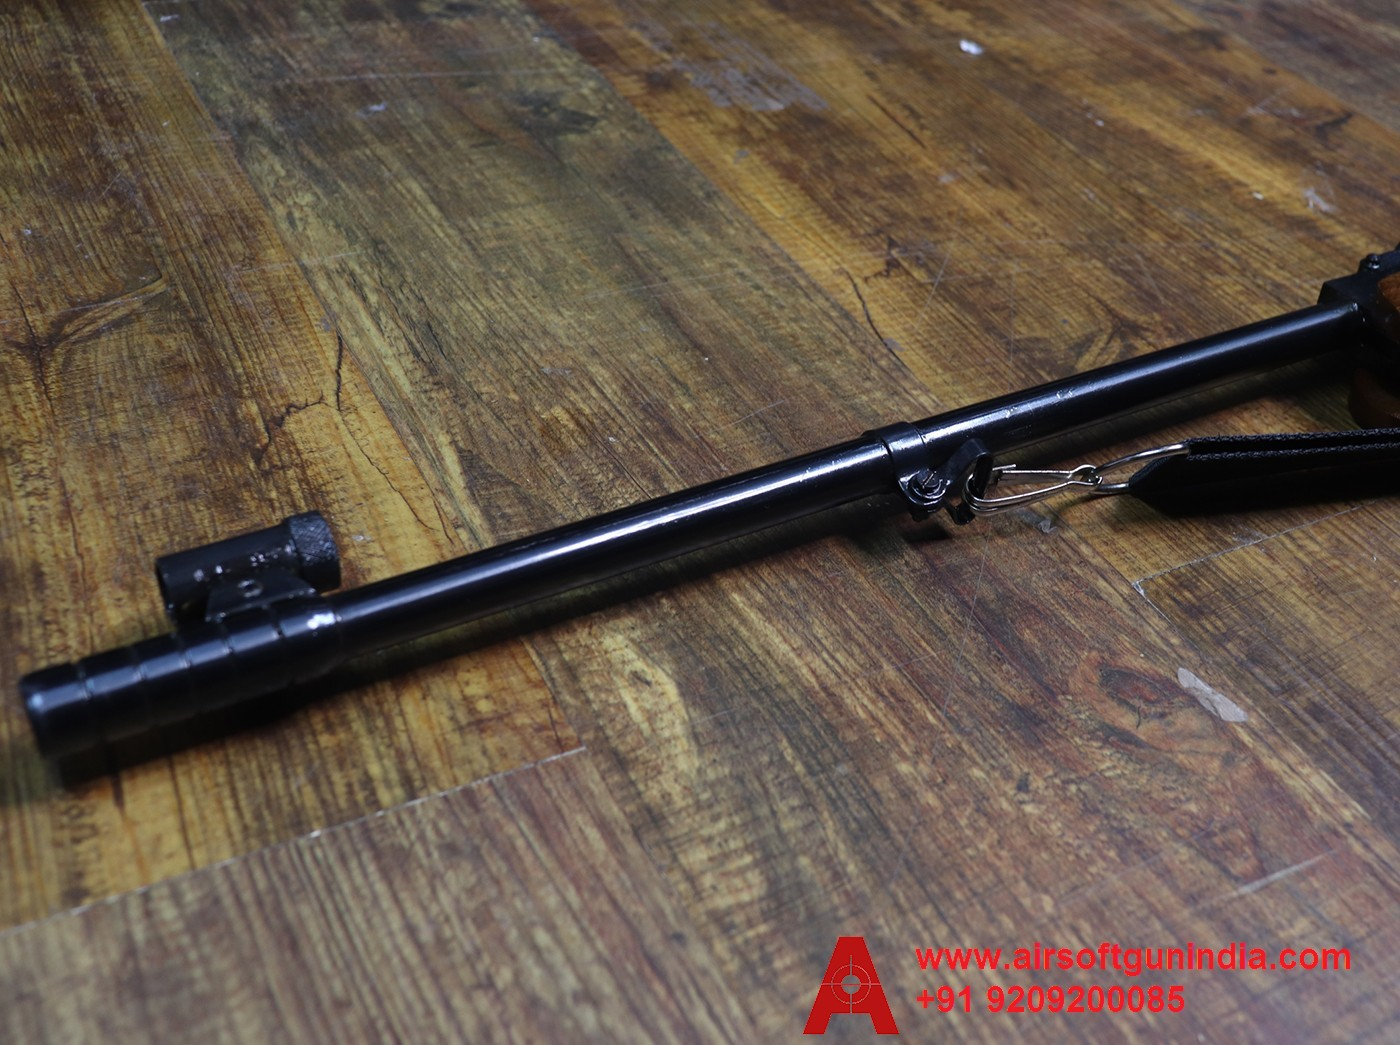 PINAKA .177 AIR RIFLE  BY AIRSOFT GUN INDIA BROWN